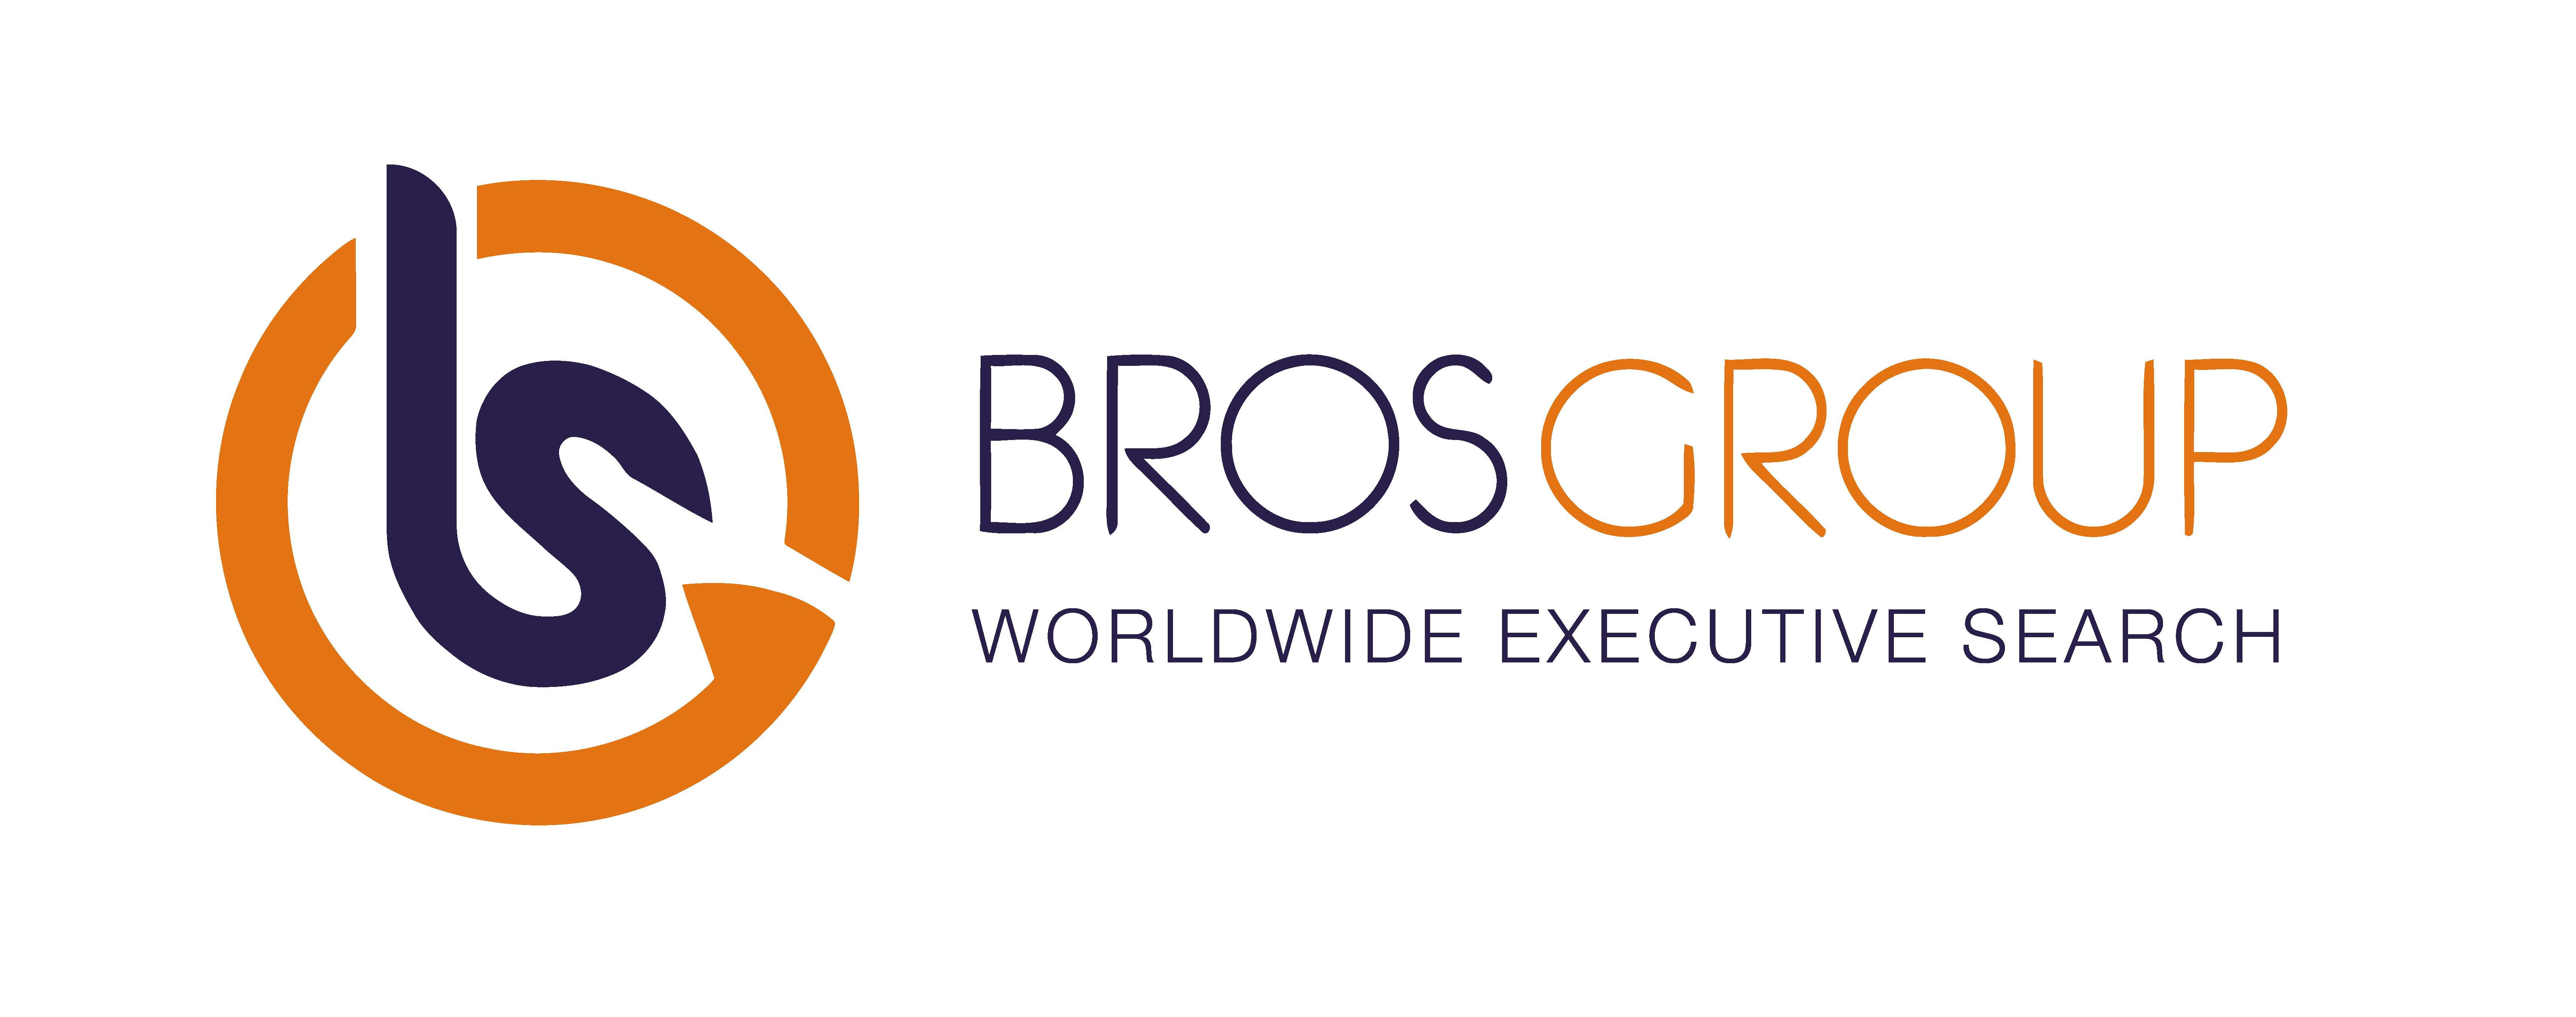 Bros Group Logo